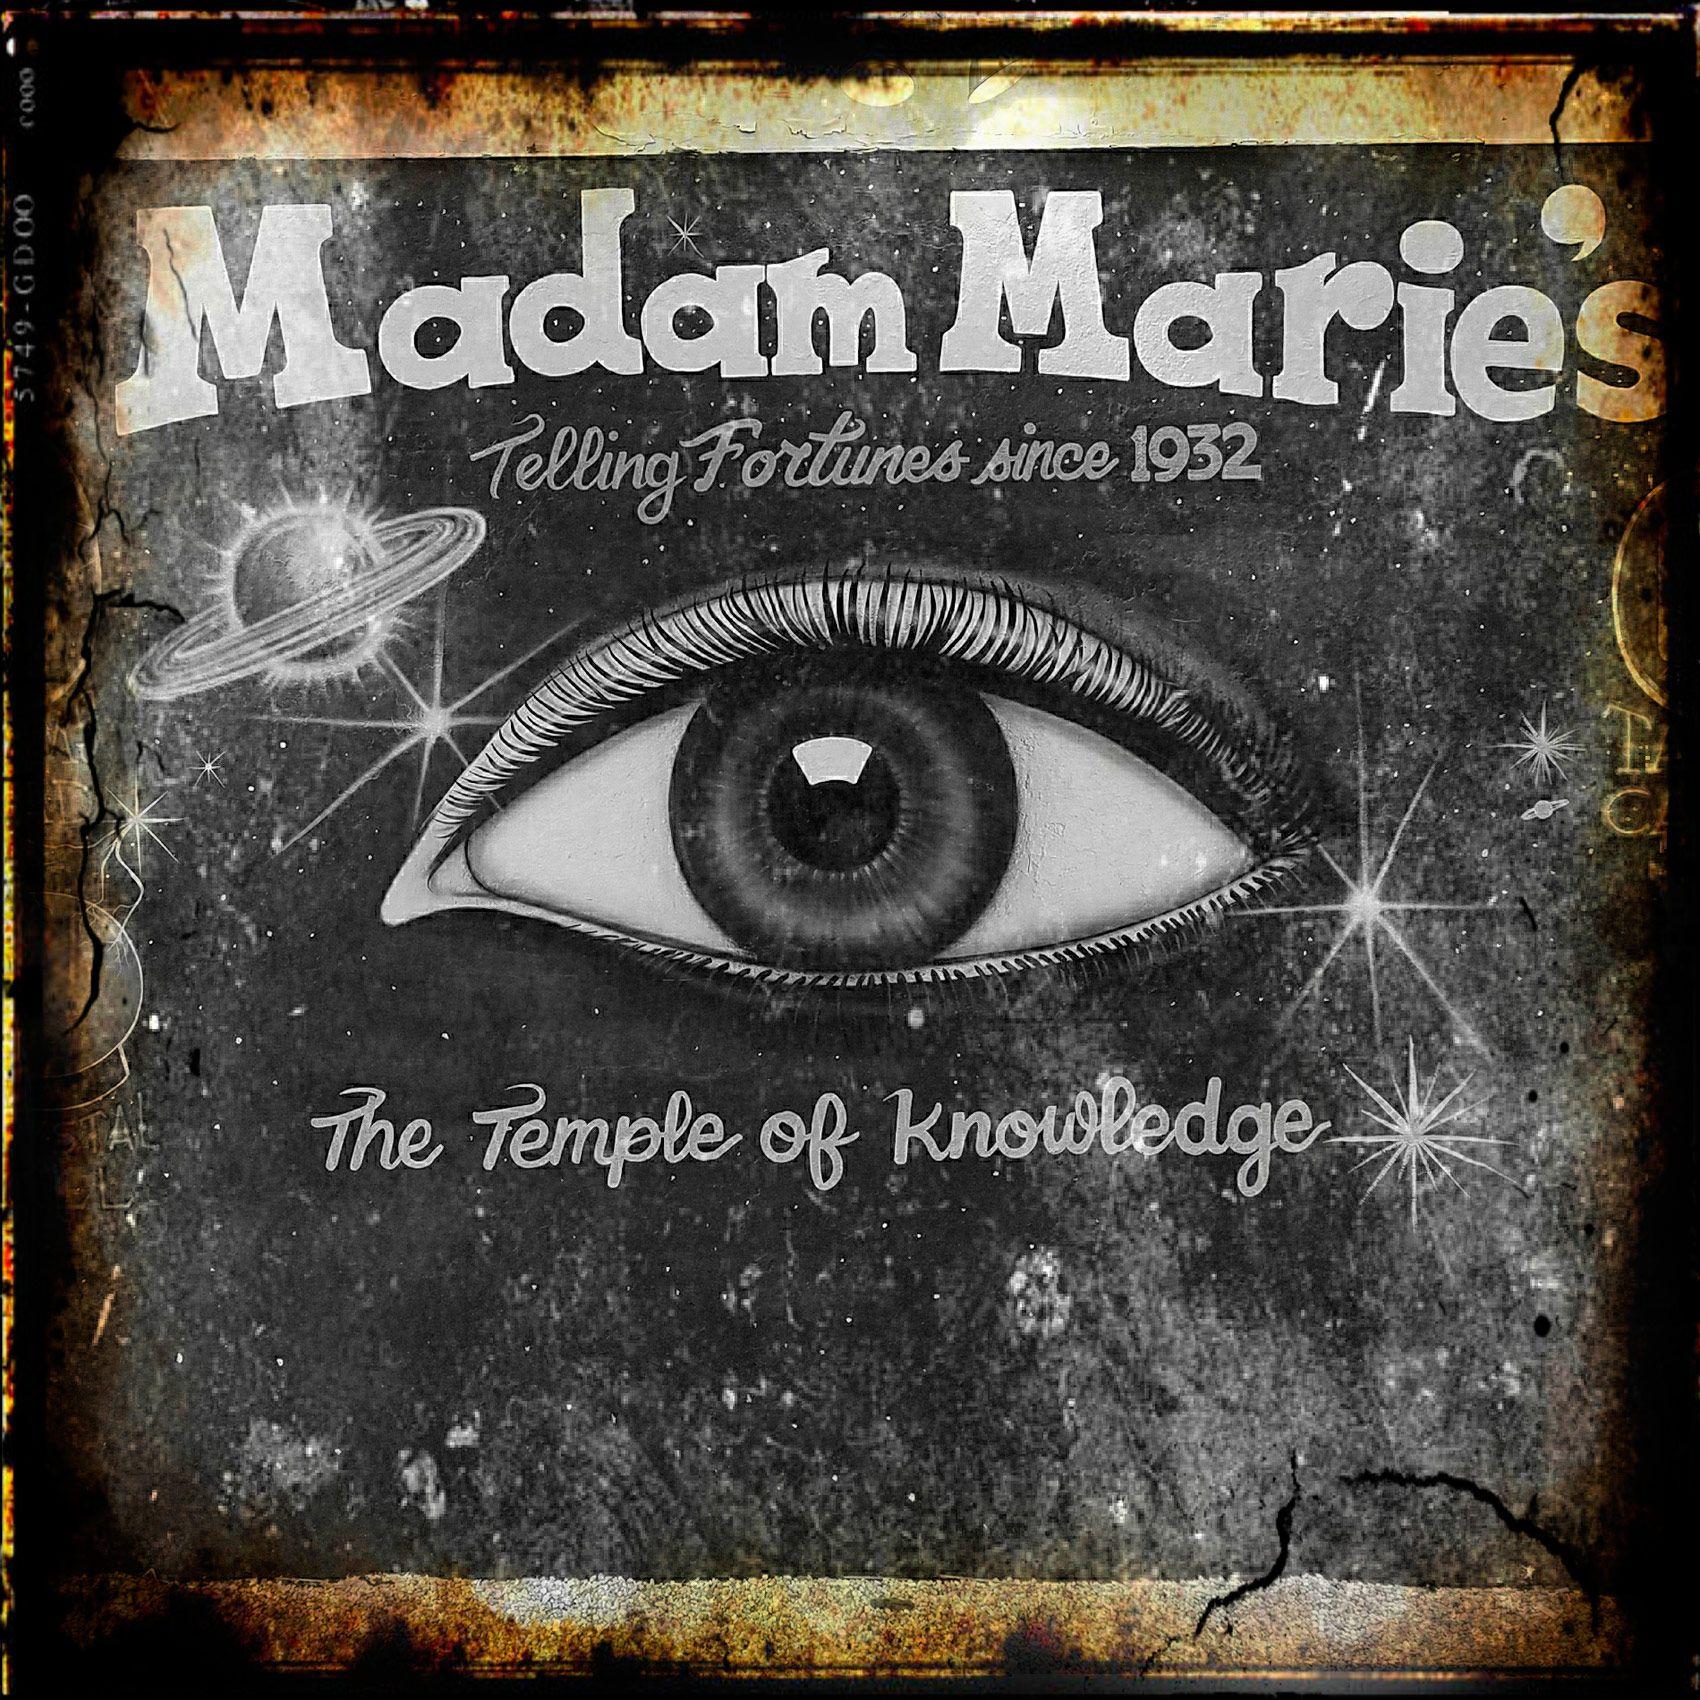 MADAM_MARIE_1700_LB.jpg